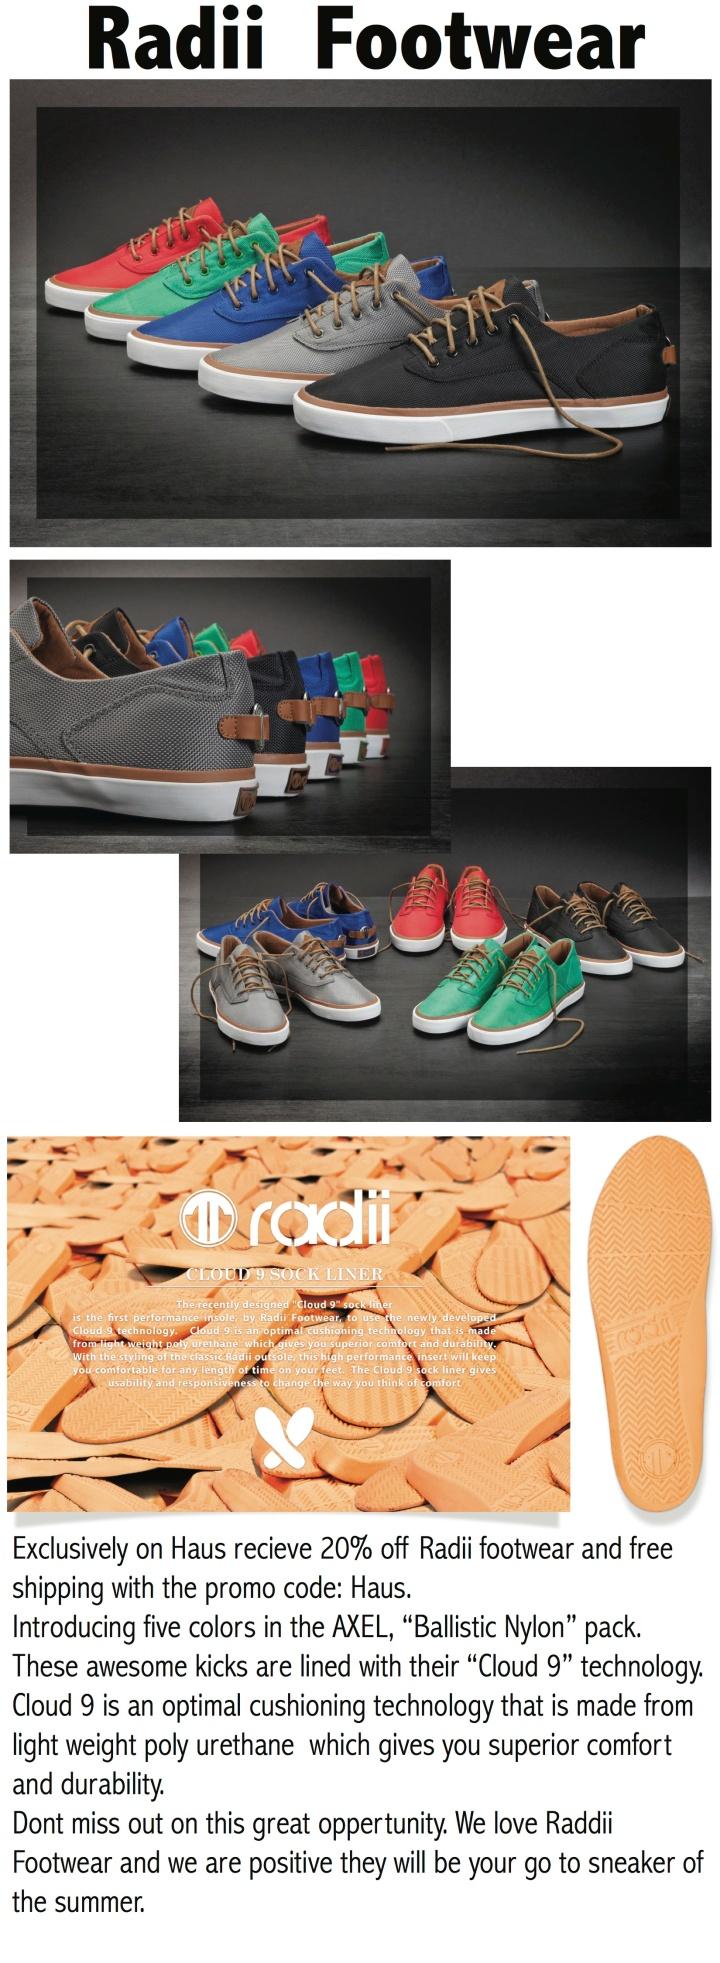 Exclusive Discount On Radii Footwear!